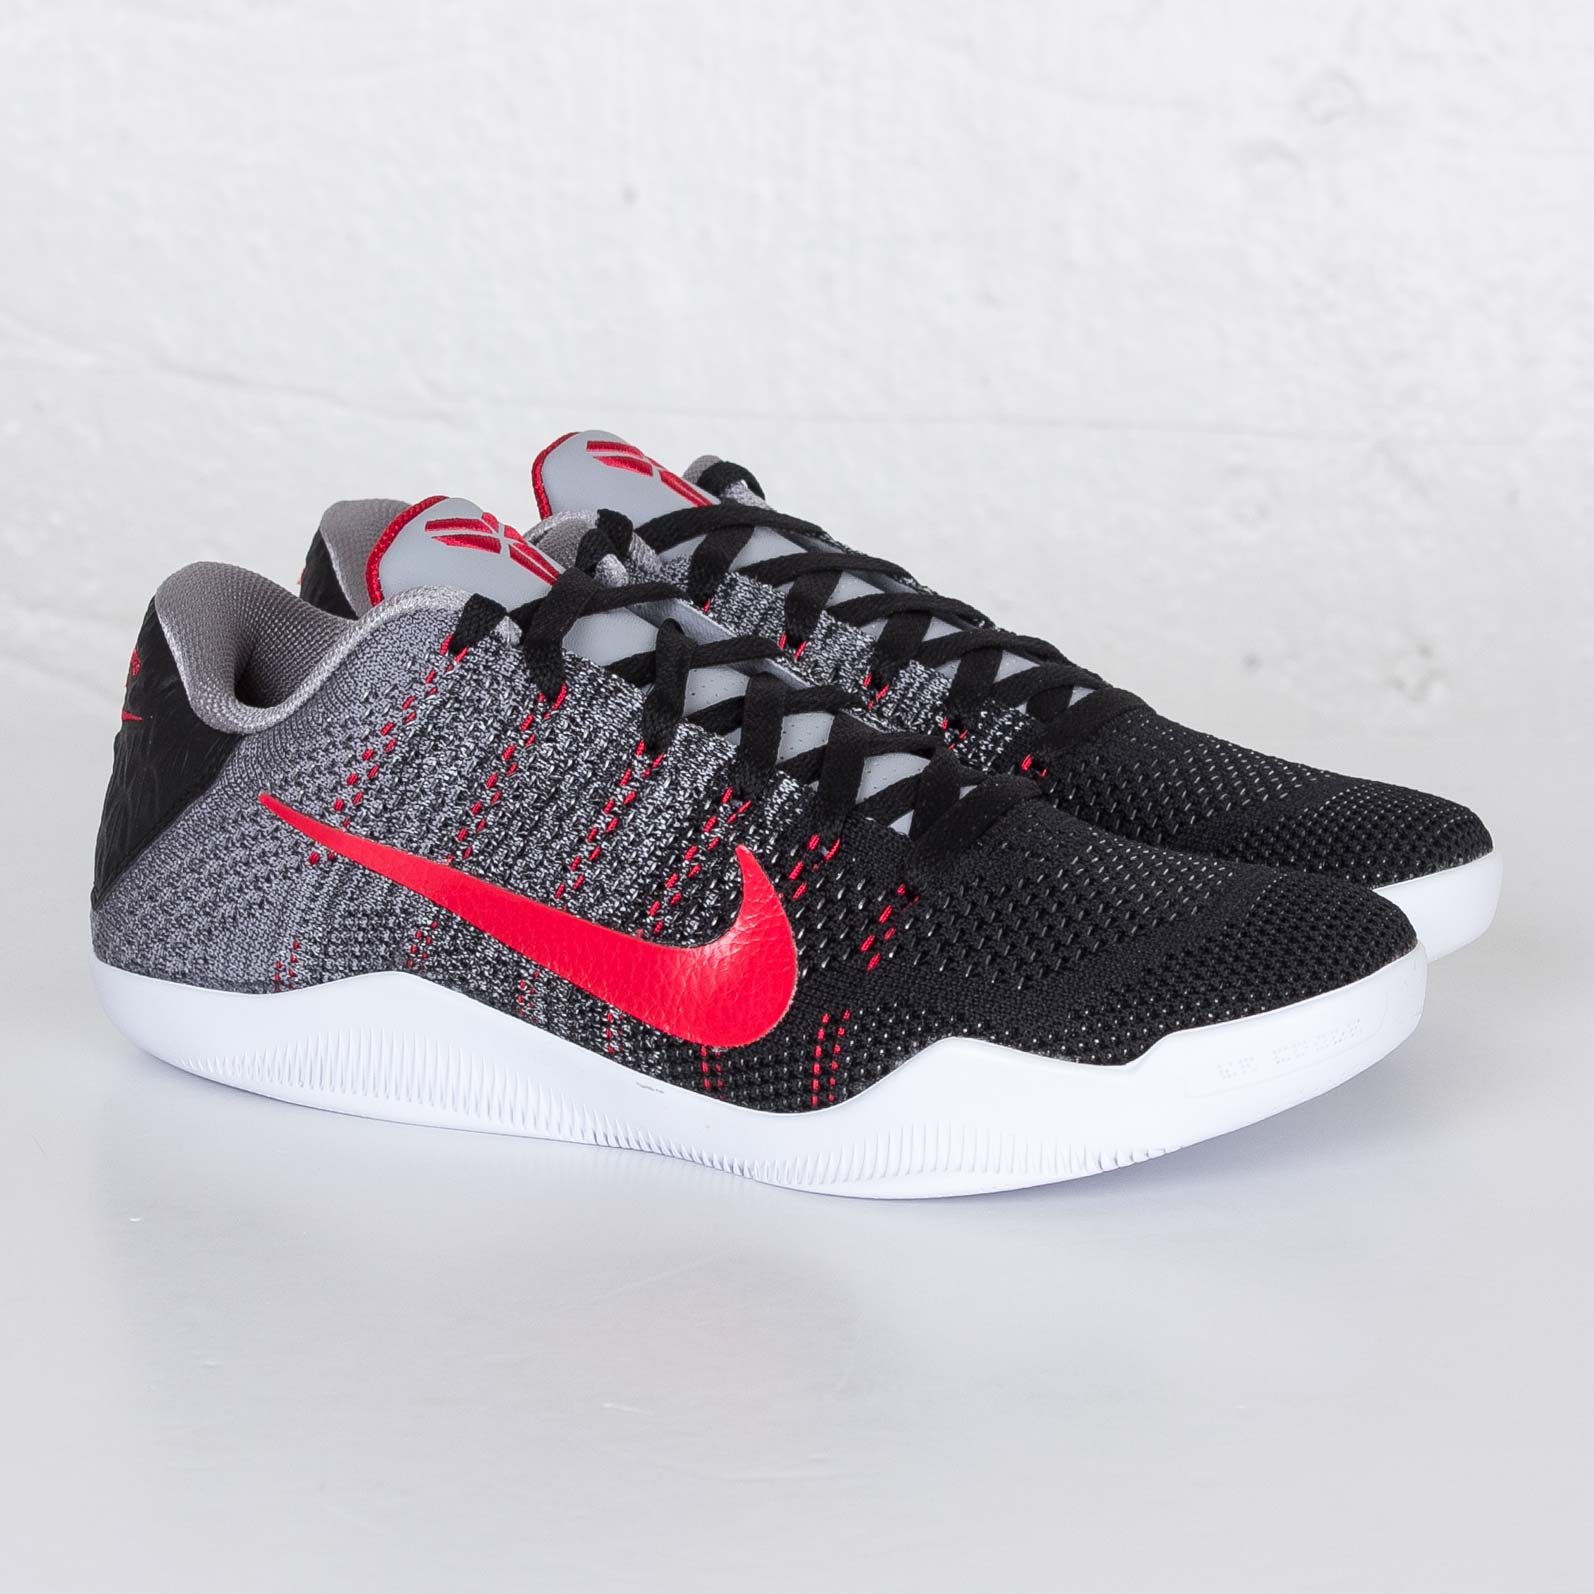 Nike Kobe XI Elite Low - 822675-060 - Sneakersnstuff  43a5b5975